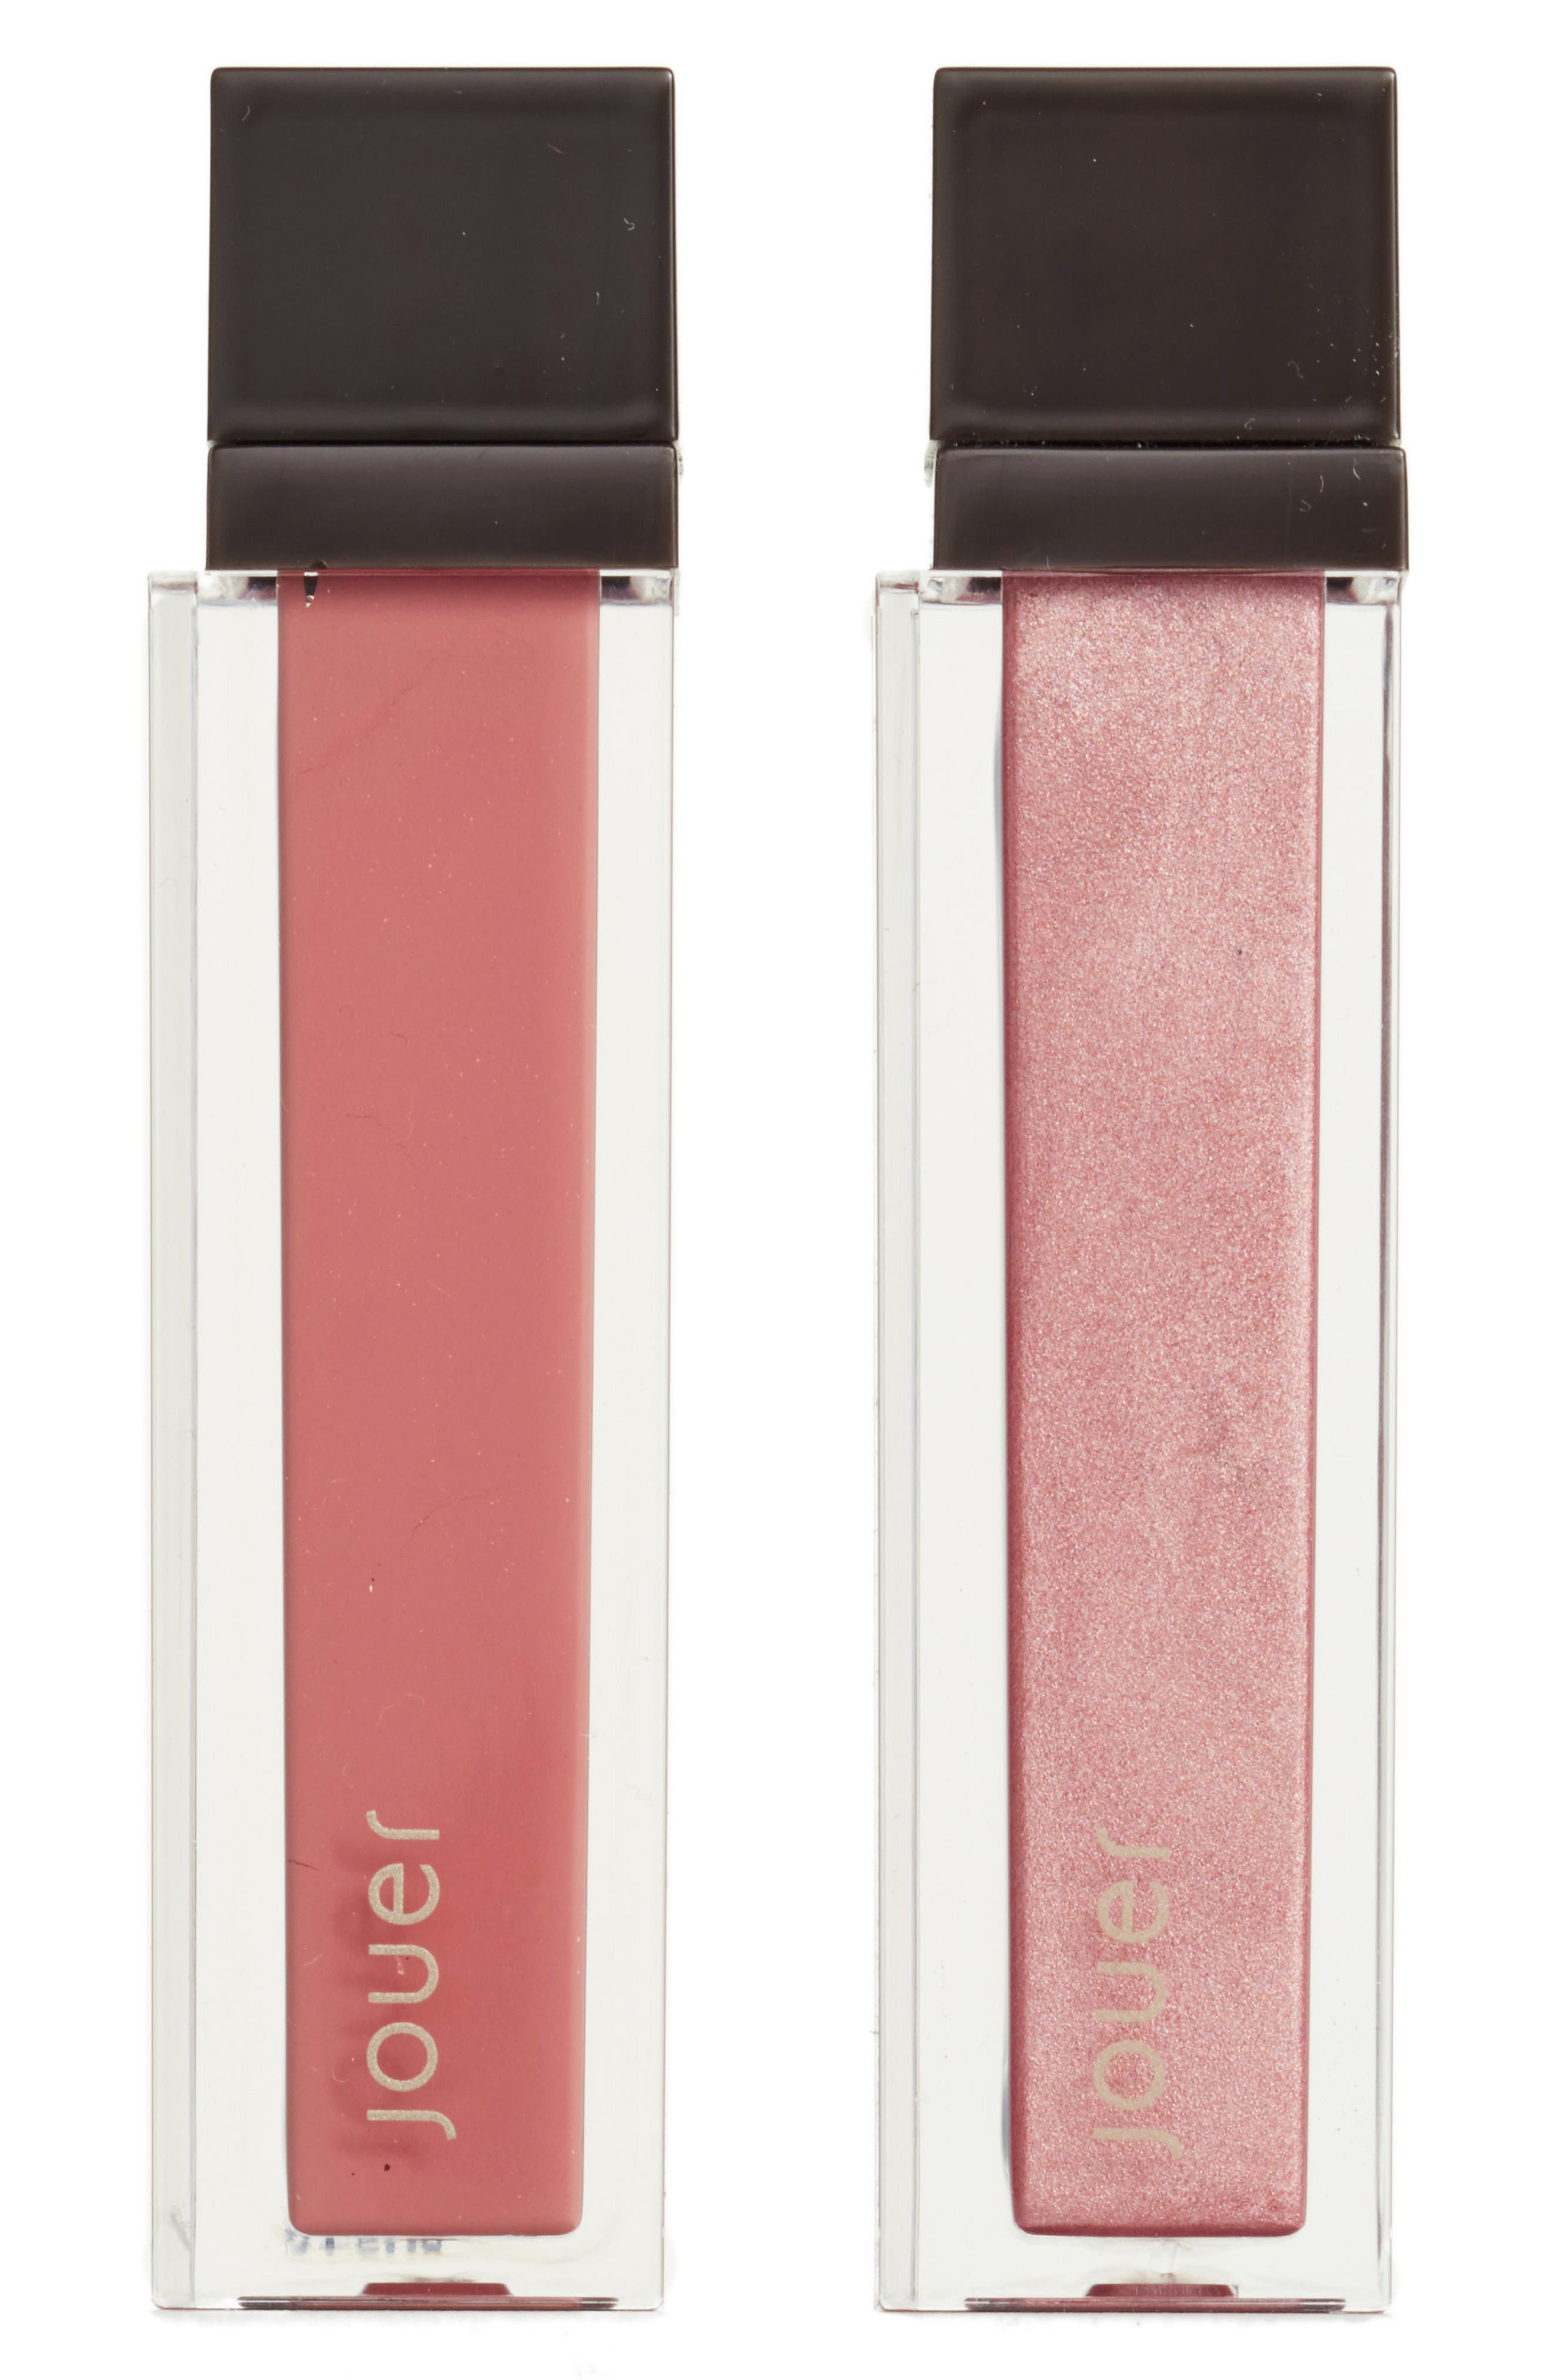 Jouer Melon & Citronade Rose Long-Wear Lip Crème Liquid Lipstick Duo